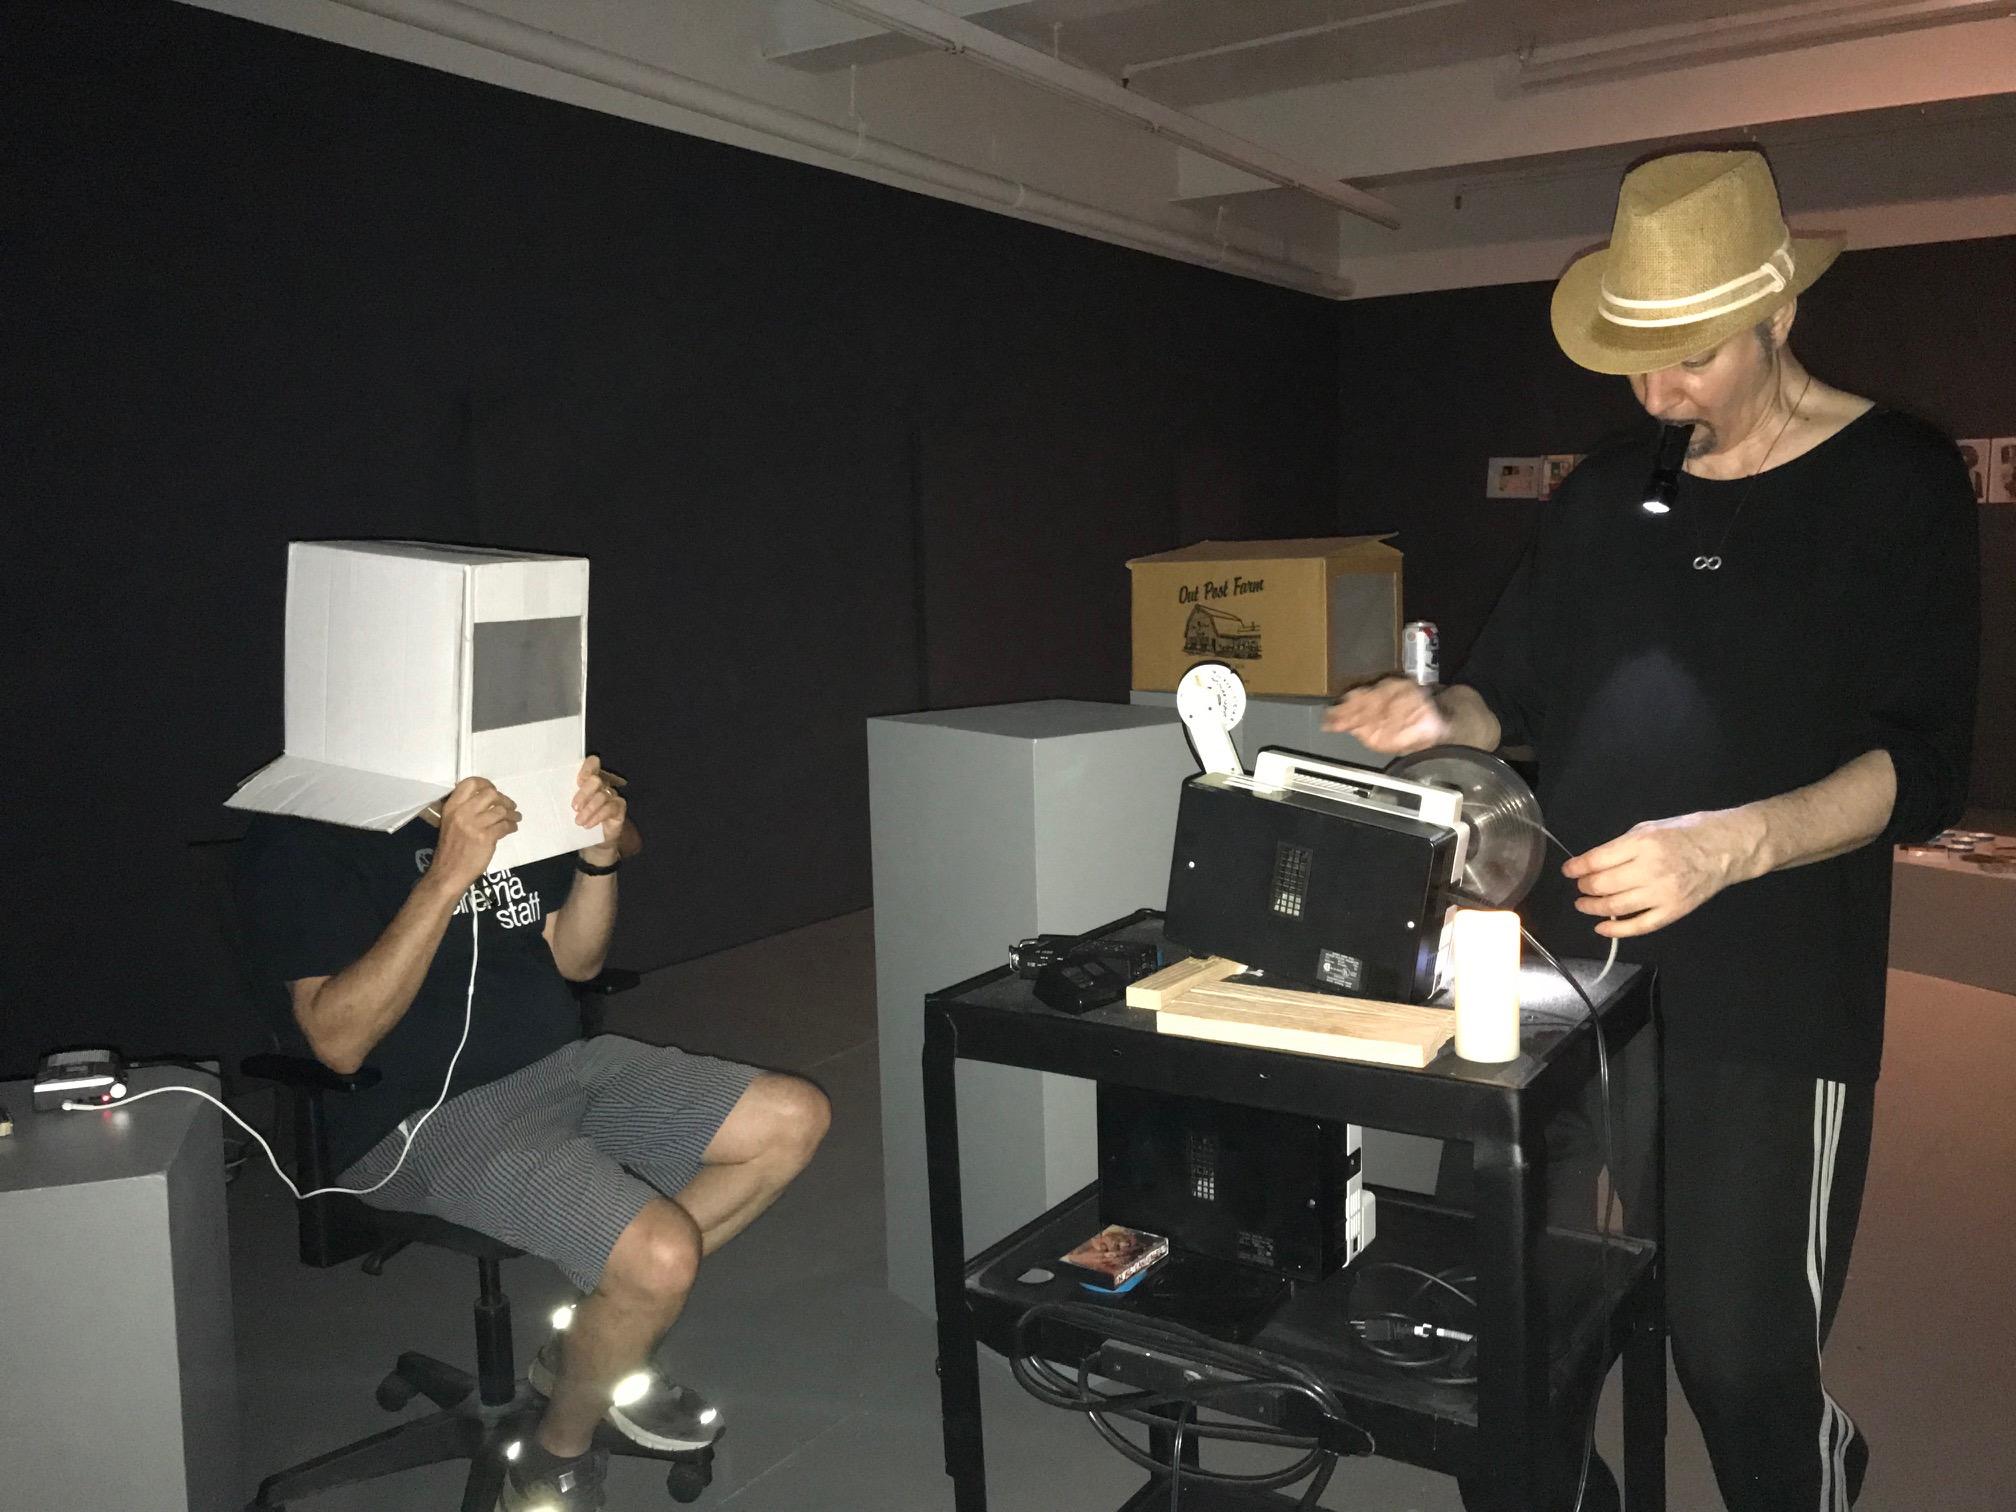 Jon Gartenberg heads into BRADLEY EROS' Invisible Cinema orgone  MovieHeadBox  (Photo by Peter Cramer)